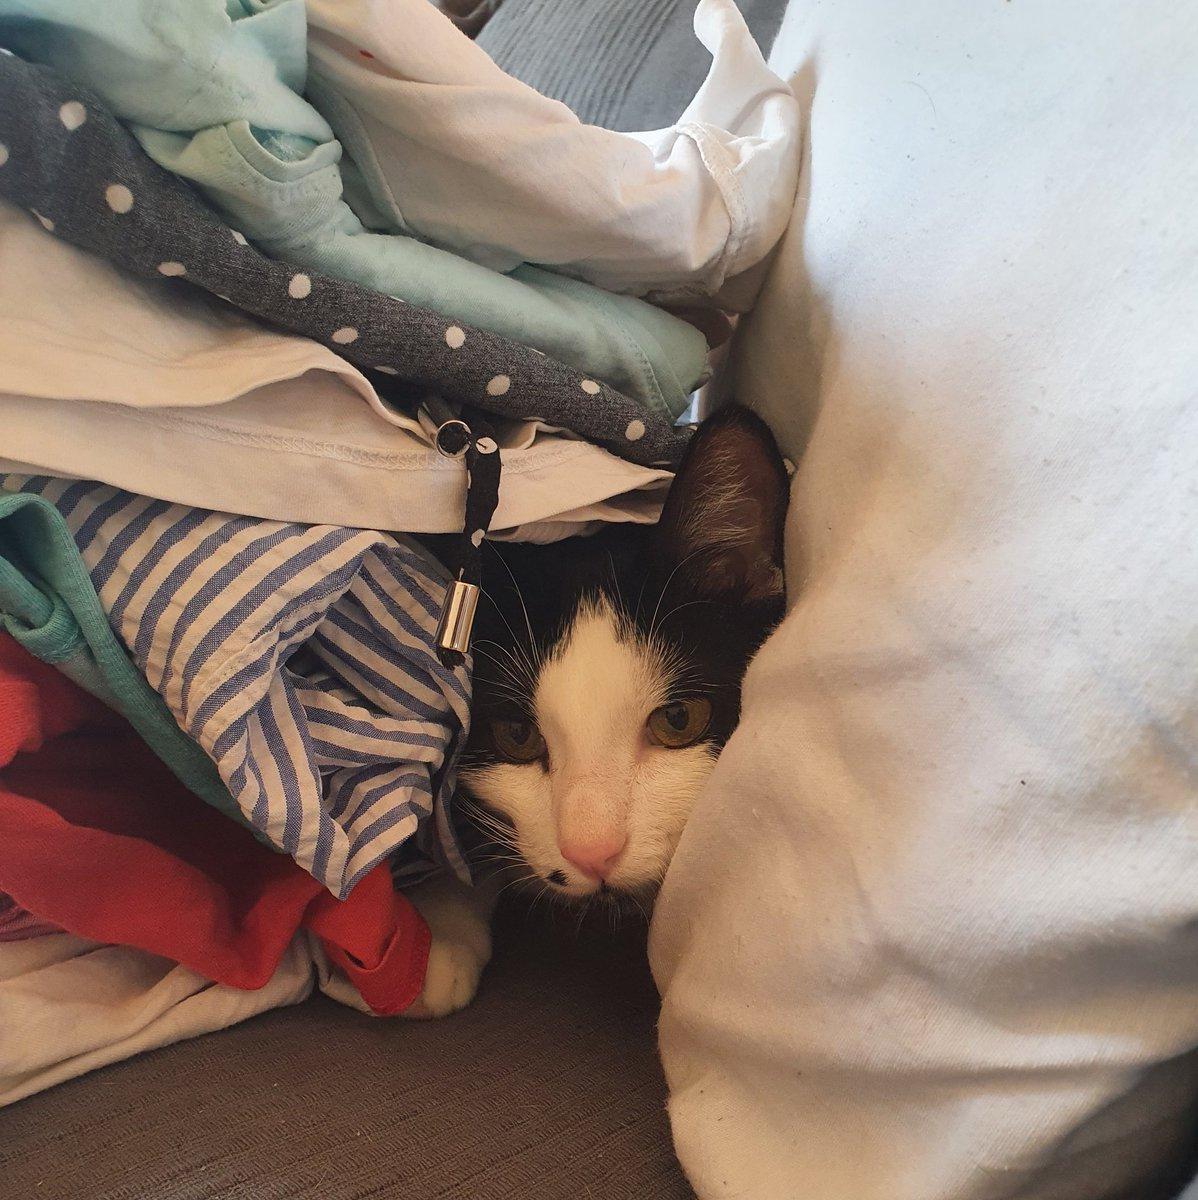 Mamá, no le digas a Sherlock que estoy aquí, que estamos jugando al escondite.  #moriarty #AdoptaNoCompres #AdoptaParaTodaLaVida #AdopcionResponsable #gatos #gatosgraciosospic.twitter.com/yBEXuFniCs